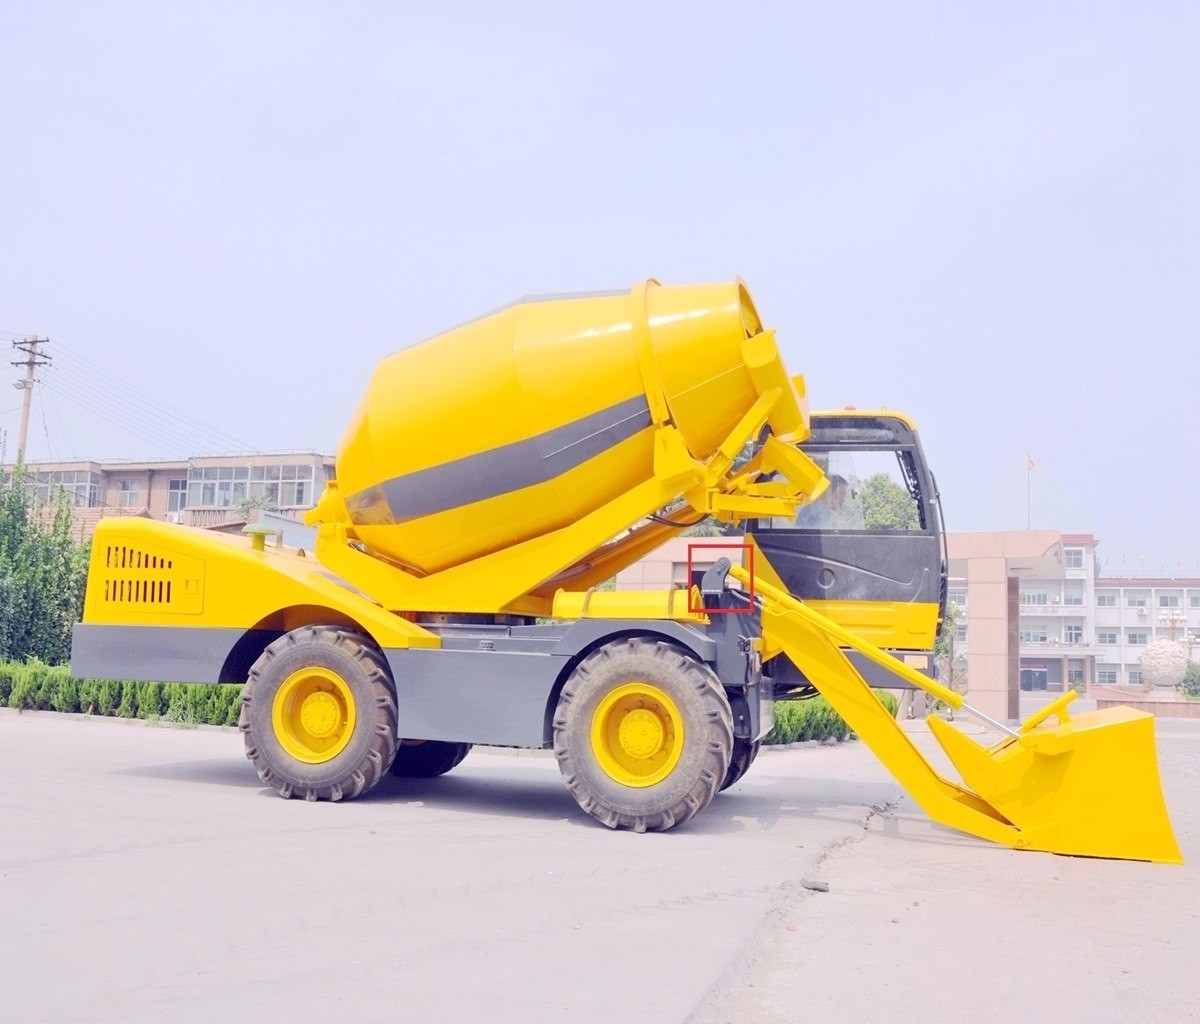 Sales 2018 Self Loading Mobile Concrete Mixer, Buy 2018 Self Loading Mobile Concrete Mixer, 2018 Self Loading Mobile Concrete Mixer Factory, 2018 Self Loading Mobile Concrete Mixer Brands